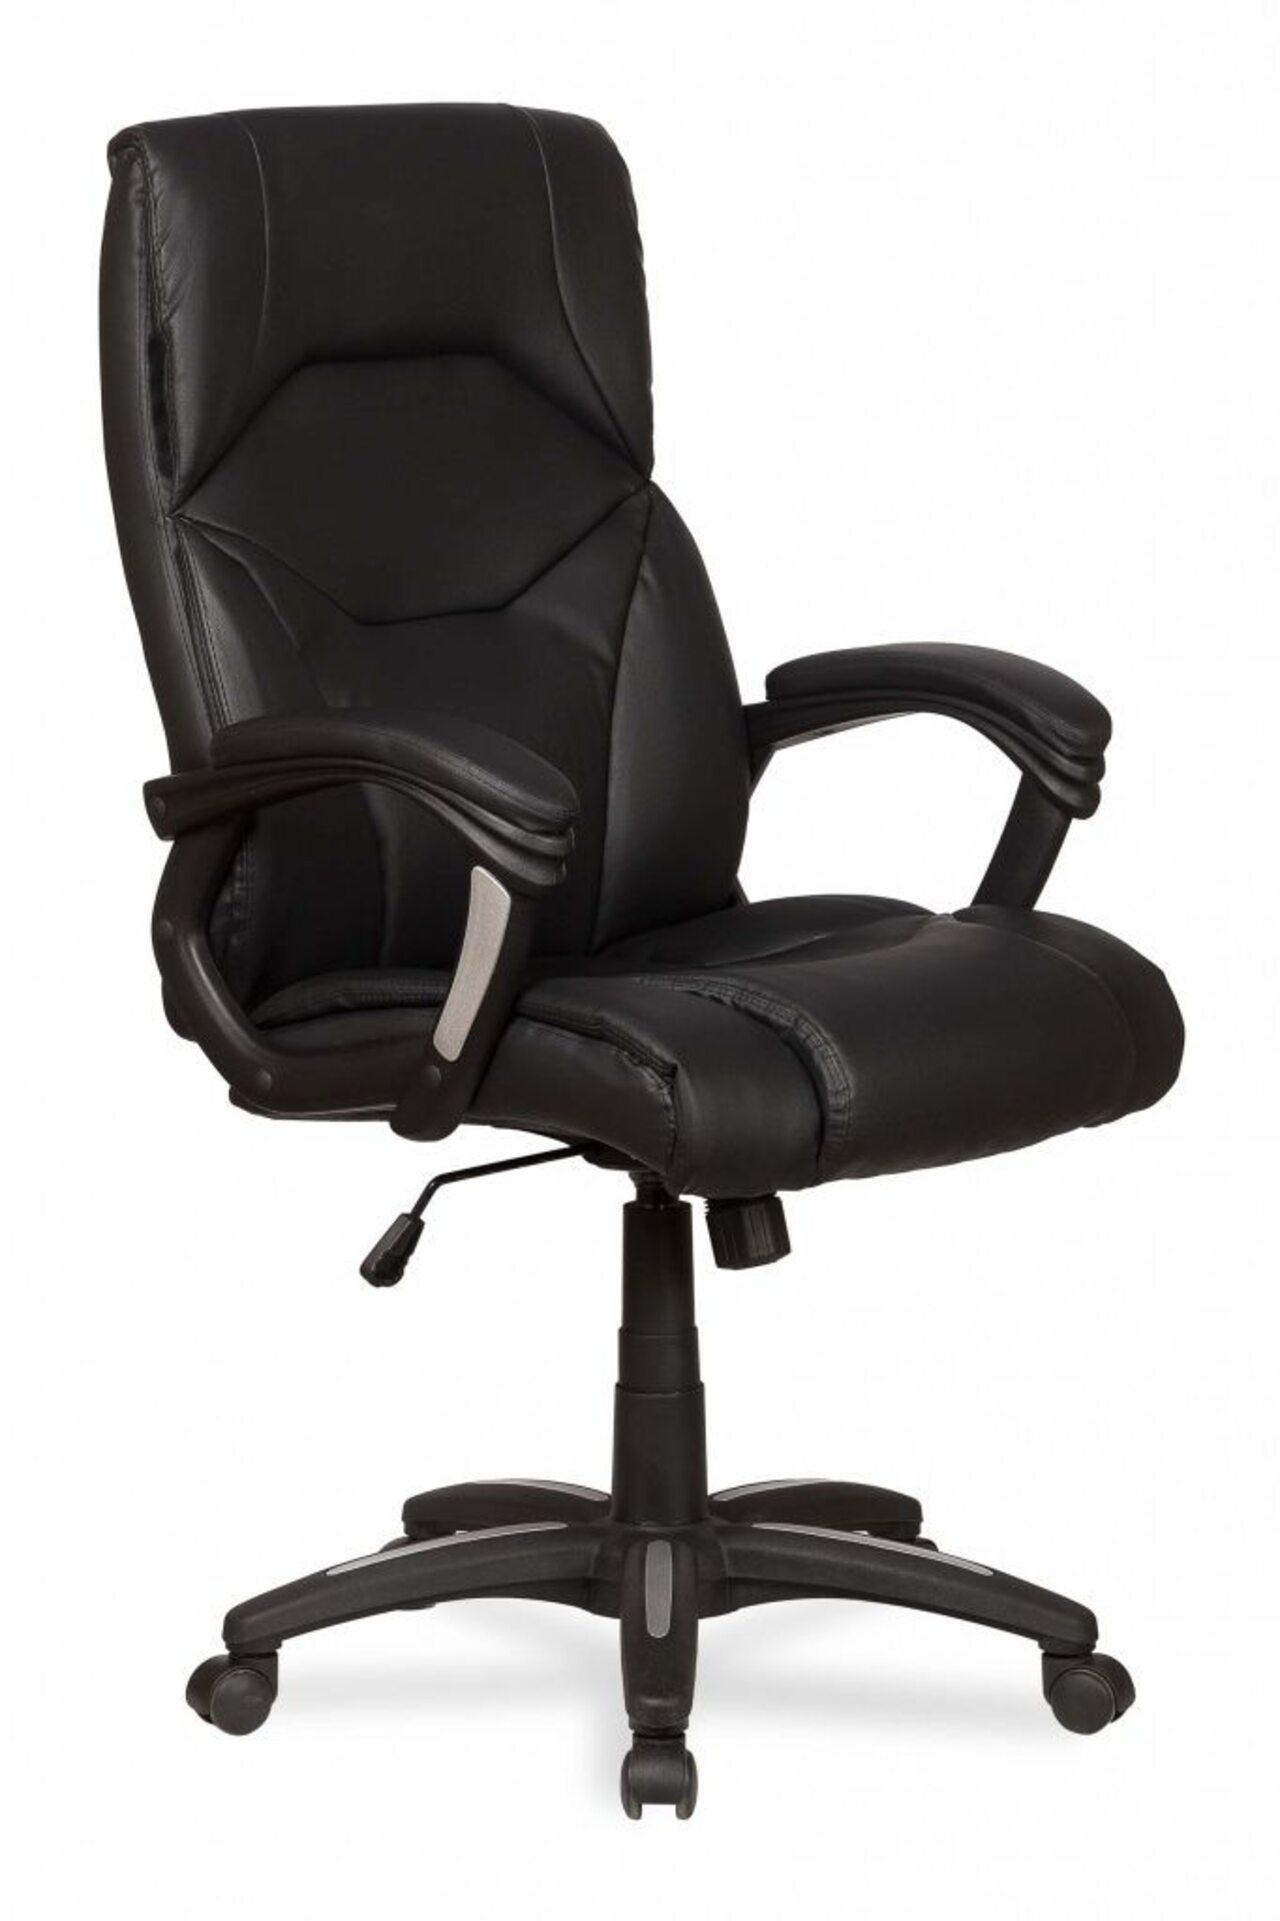 Кресло руководителя College BX-3309 - фото 1